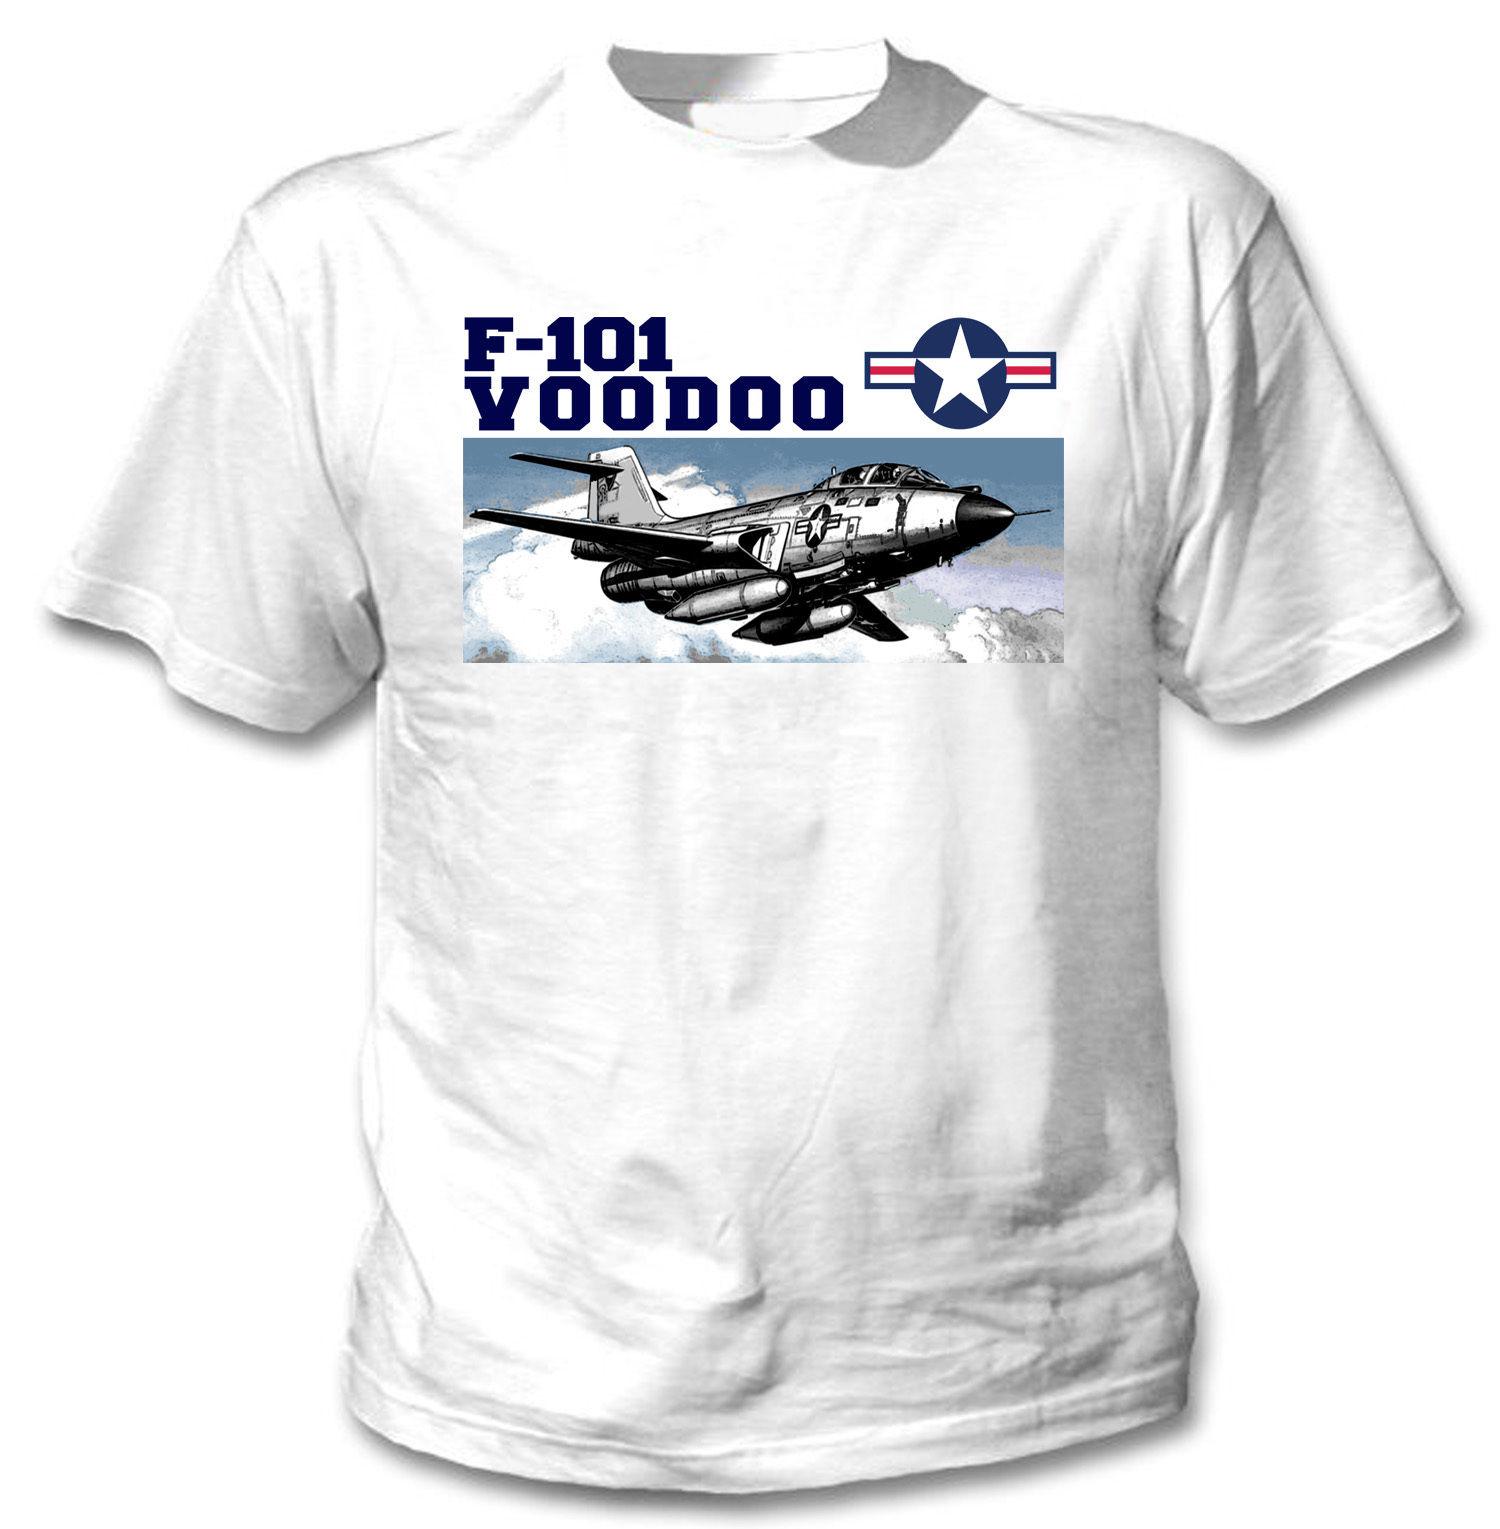 2019 F-101B avión de combate vudú. -Nueva camiseta gráfica increíble-S-M-L-XL-XXL